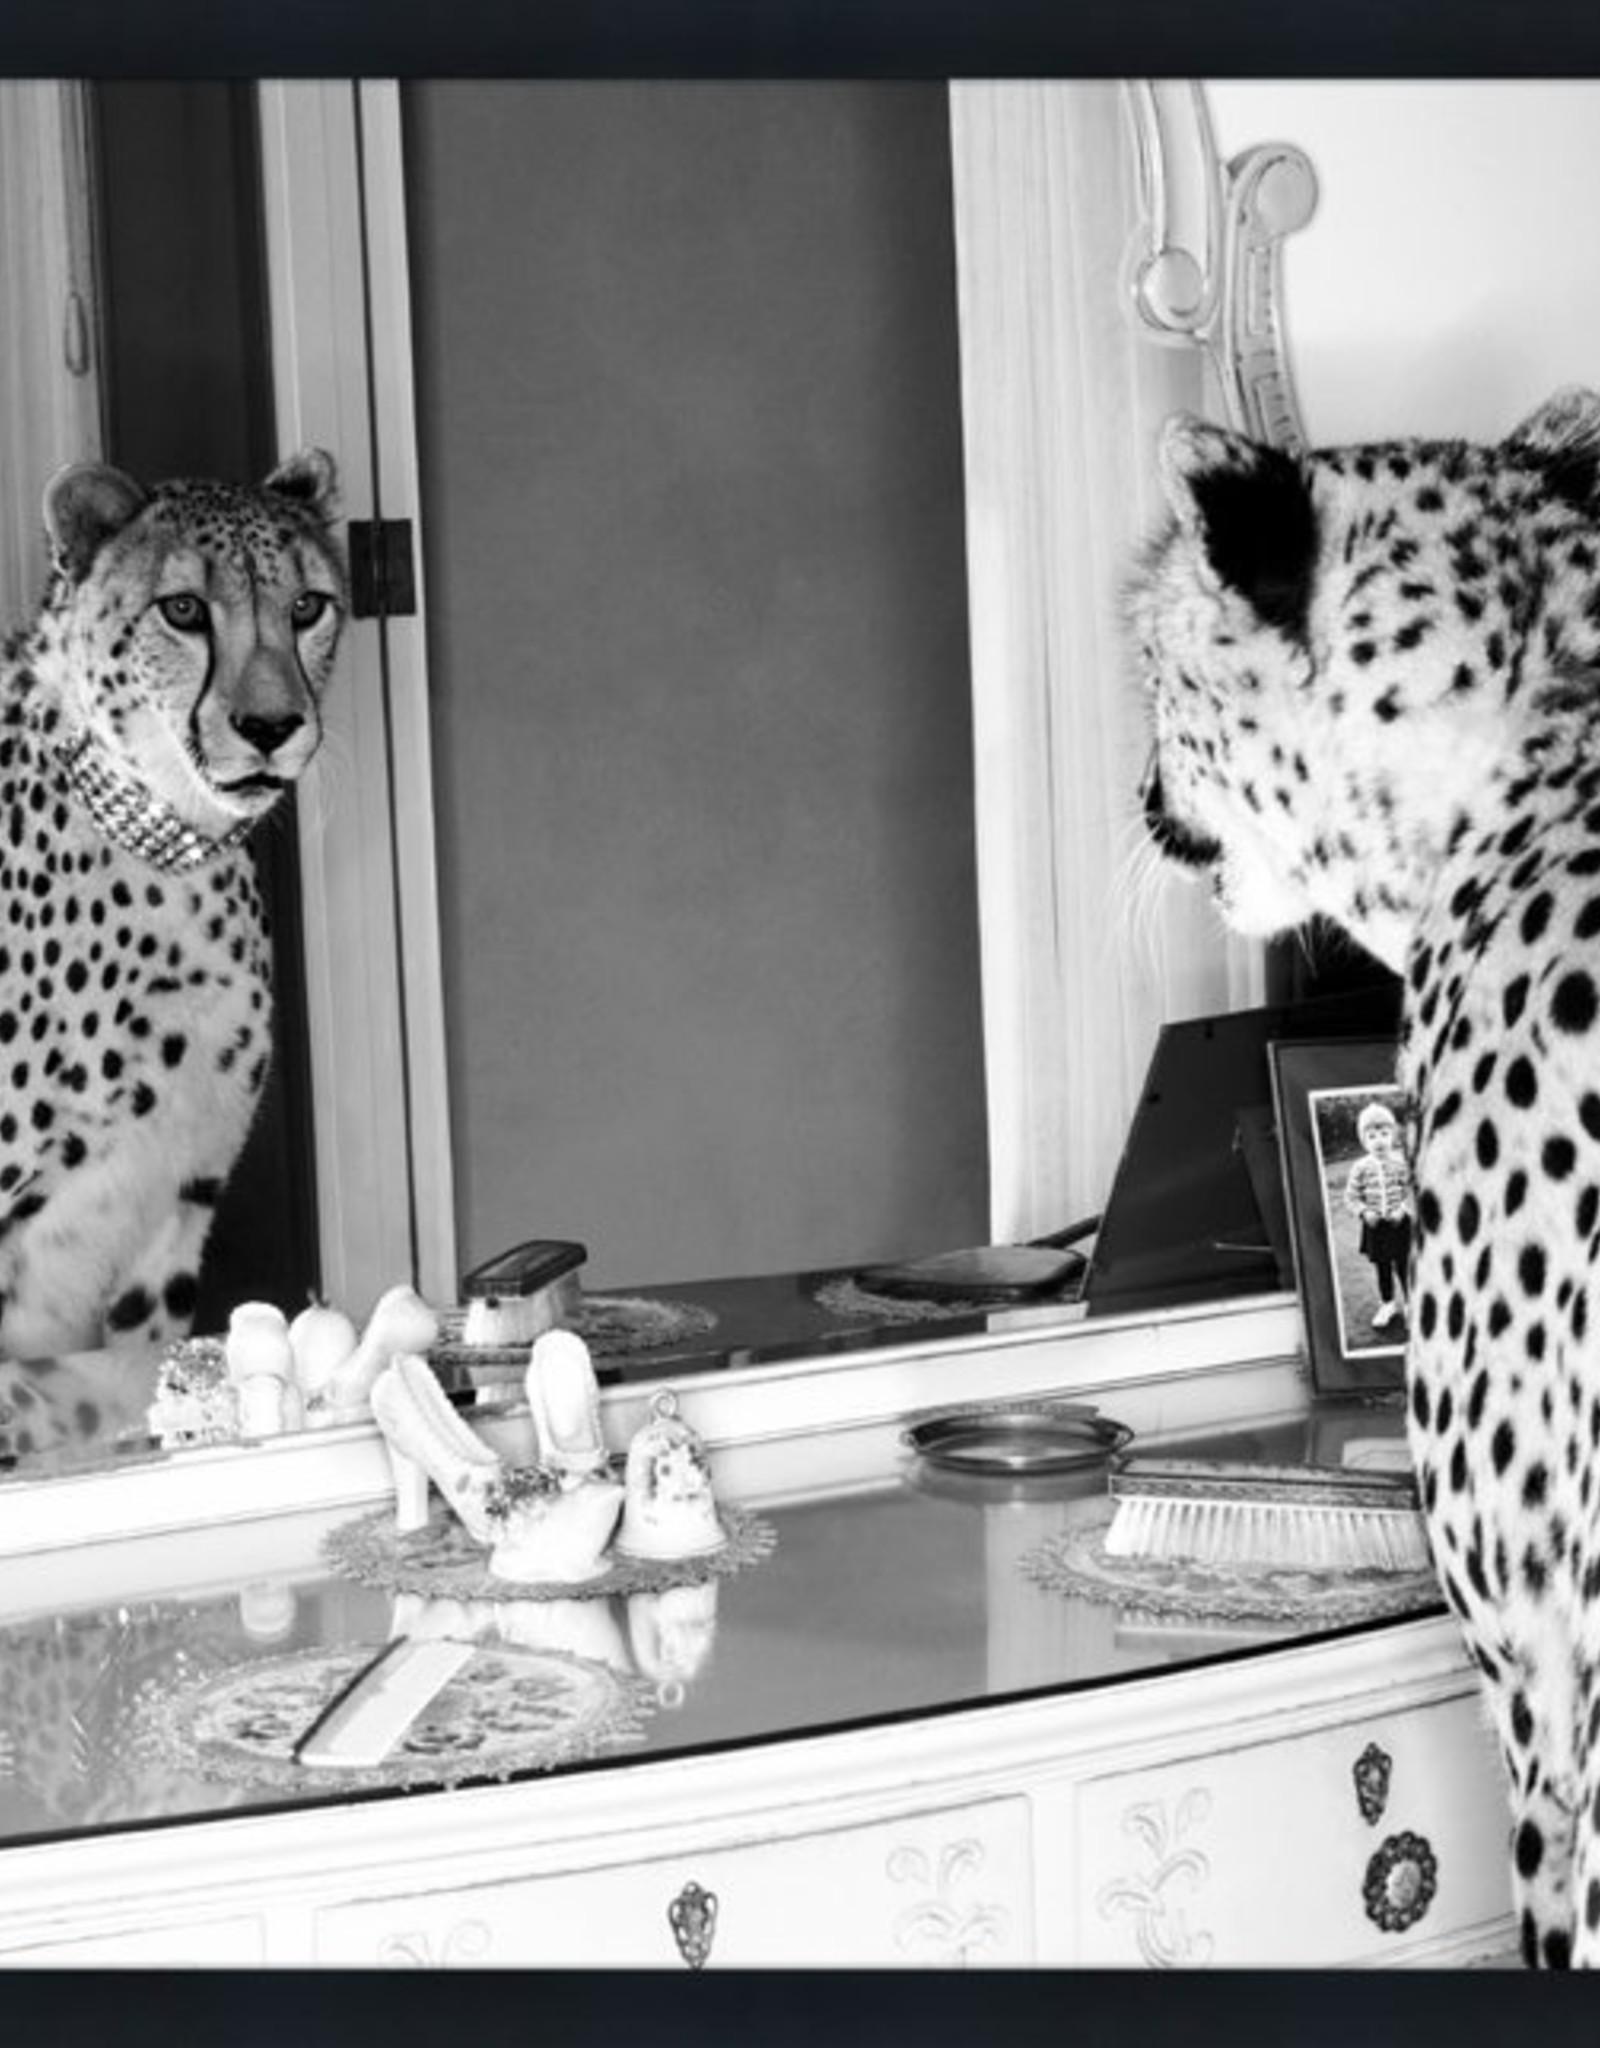 MondiArt Cheetah looking mirror 60/80